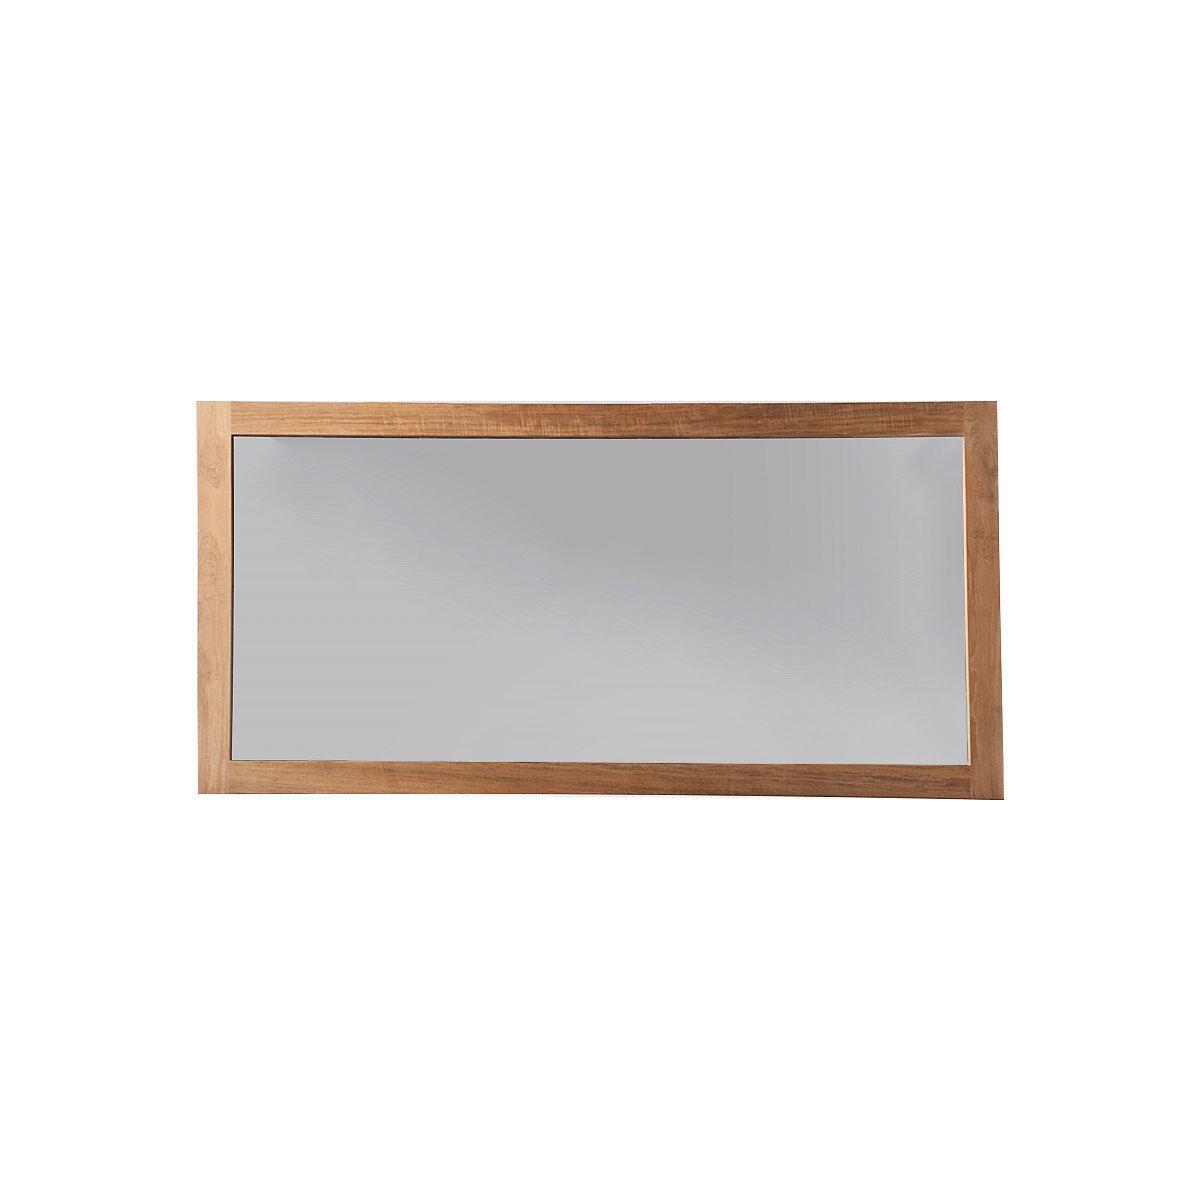 Miliboo Miroir de salle de bain teck 140x70 cm SANA